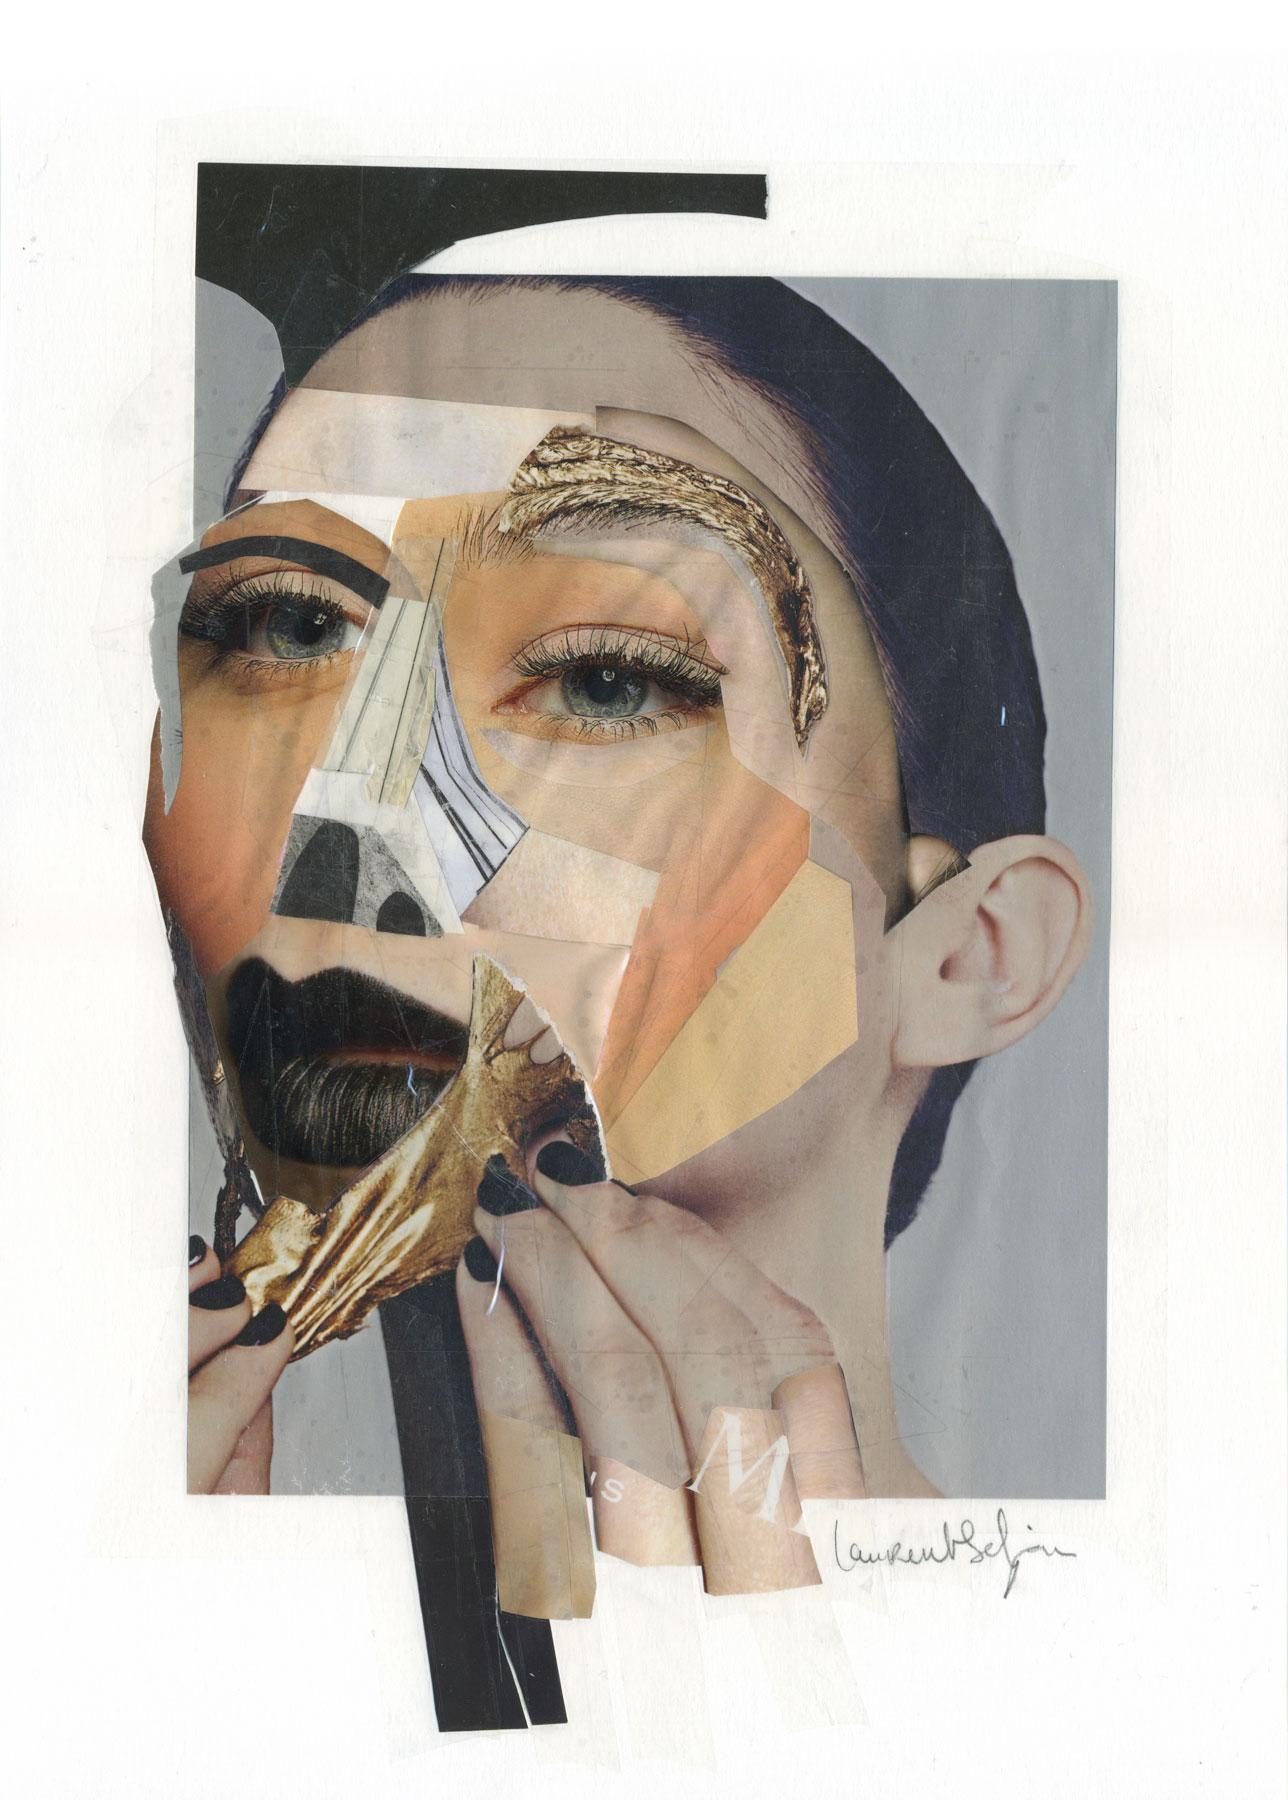 Plastic surgery - 29,7 x 42 cm